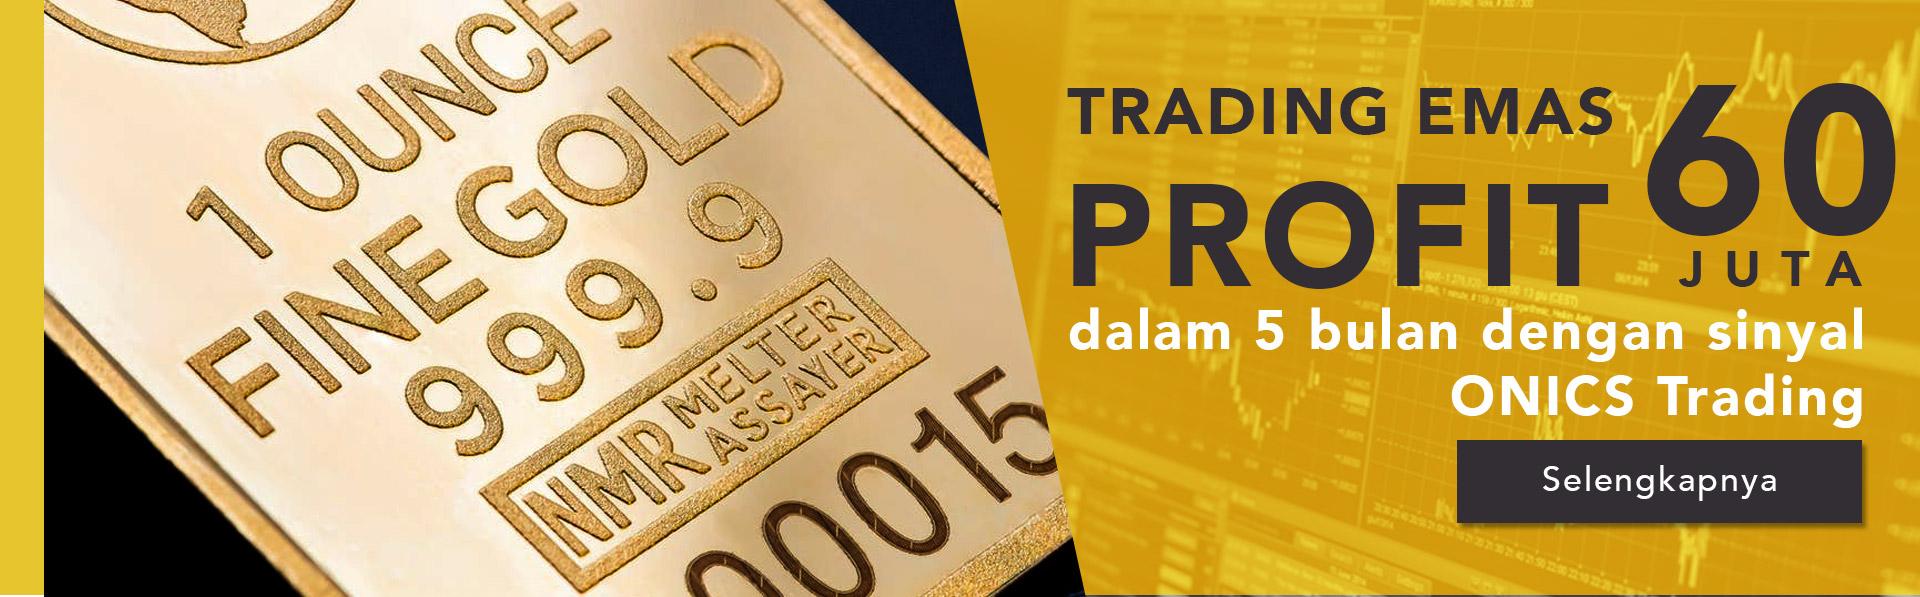 Suka Trading Emas? Intip Contoh Analisis Fundamental Gold di Sini!